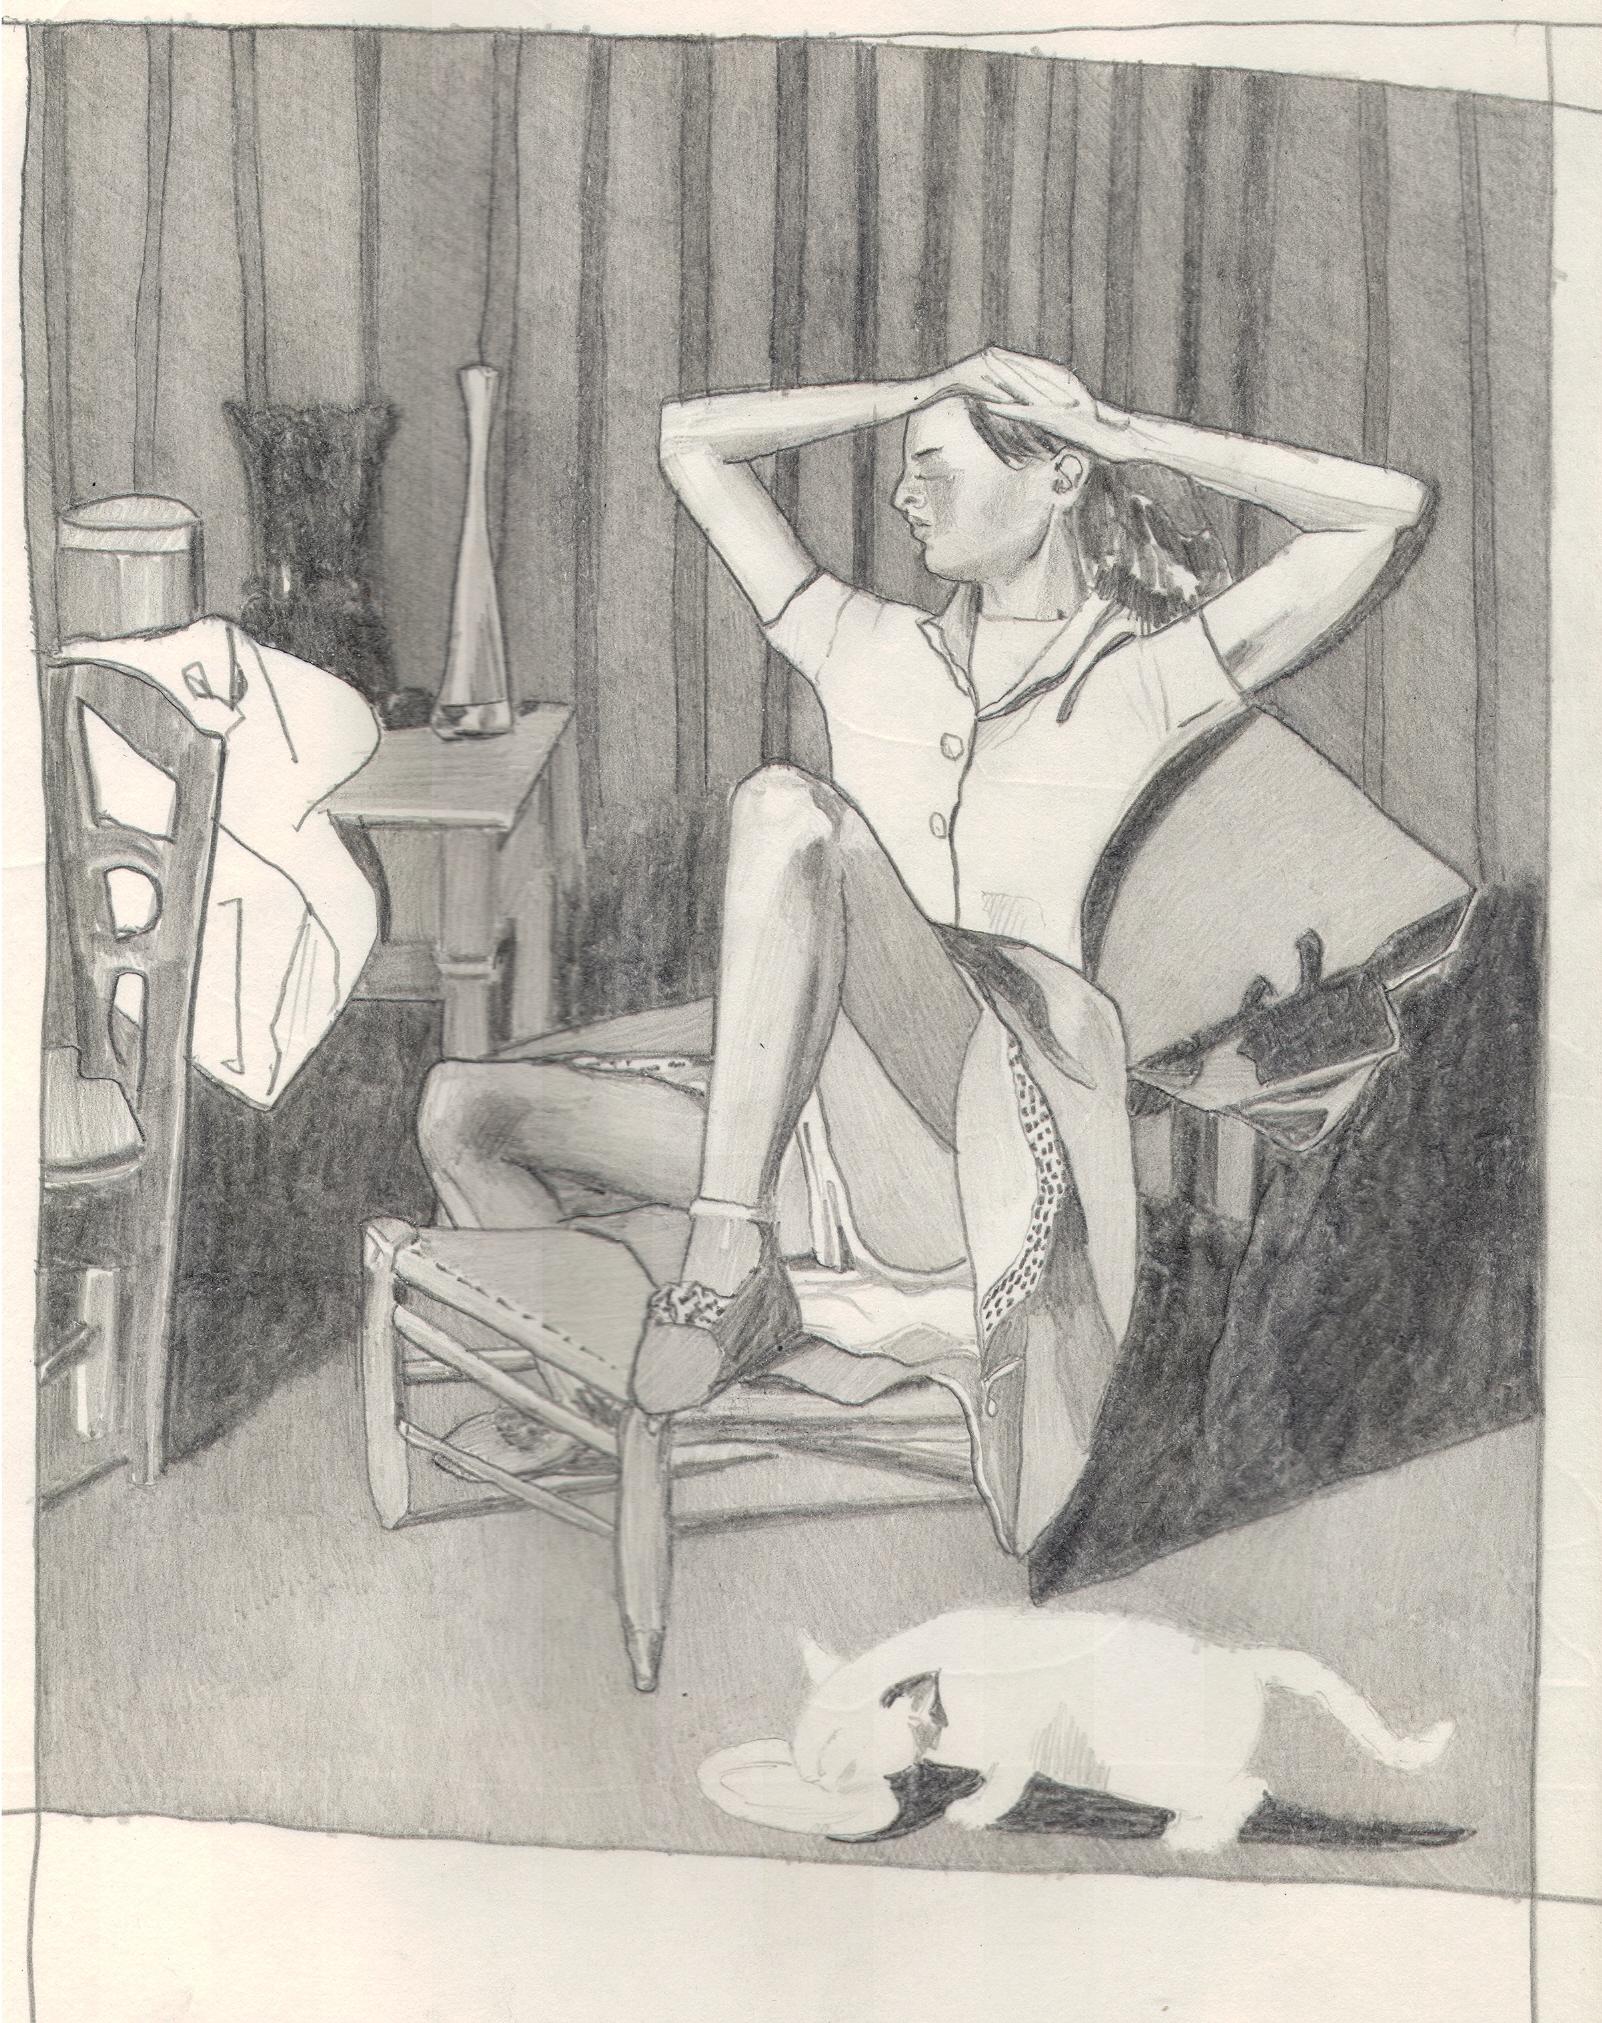 O.T. ( Serie Balthus 7 ), 2018  Bleistift auf Papier, 26x35.5cm